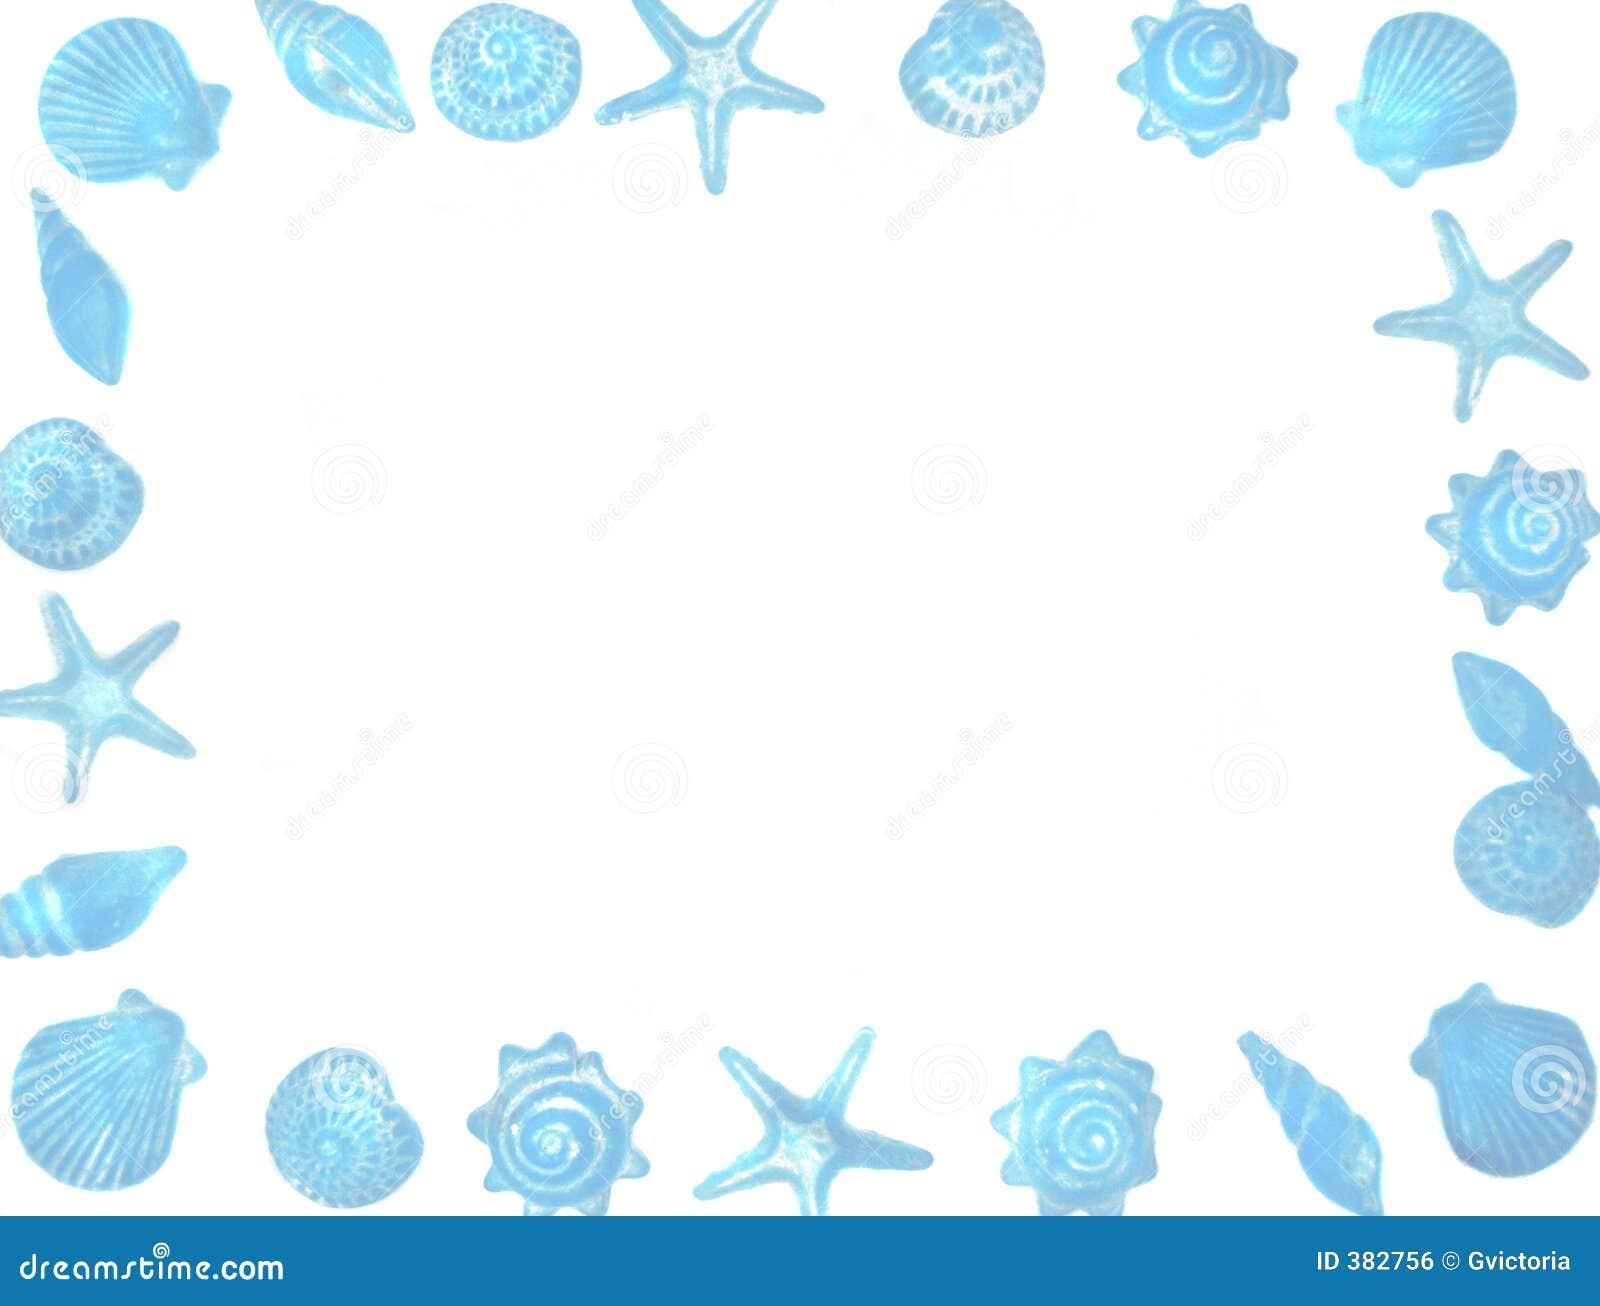 Seashell Border Royalty Free Stock Image - Image: 382756